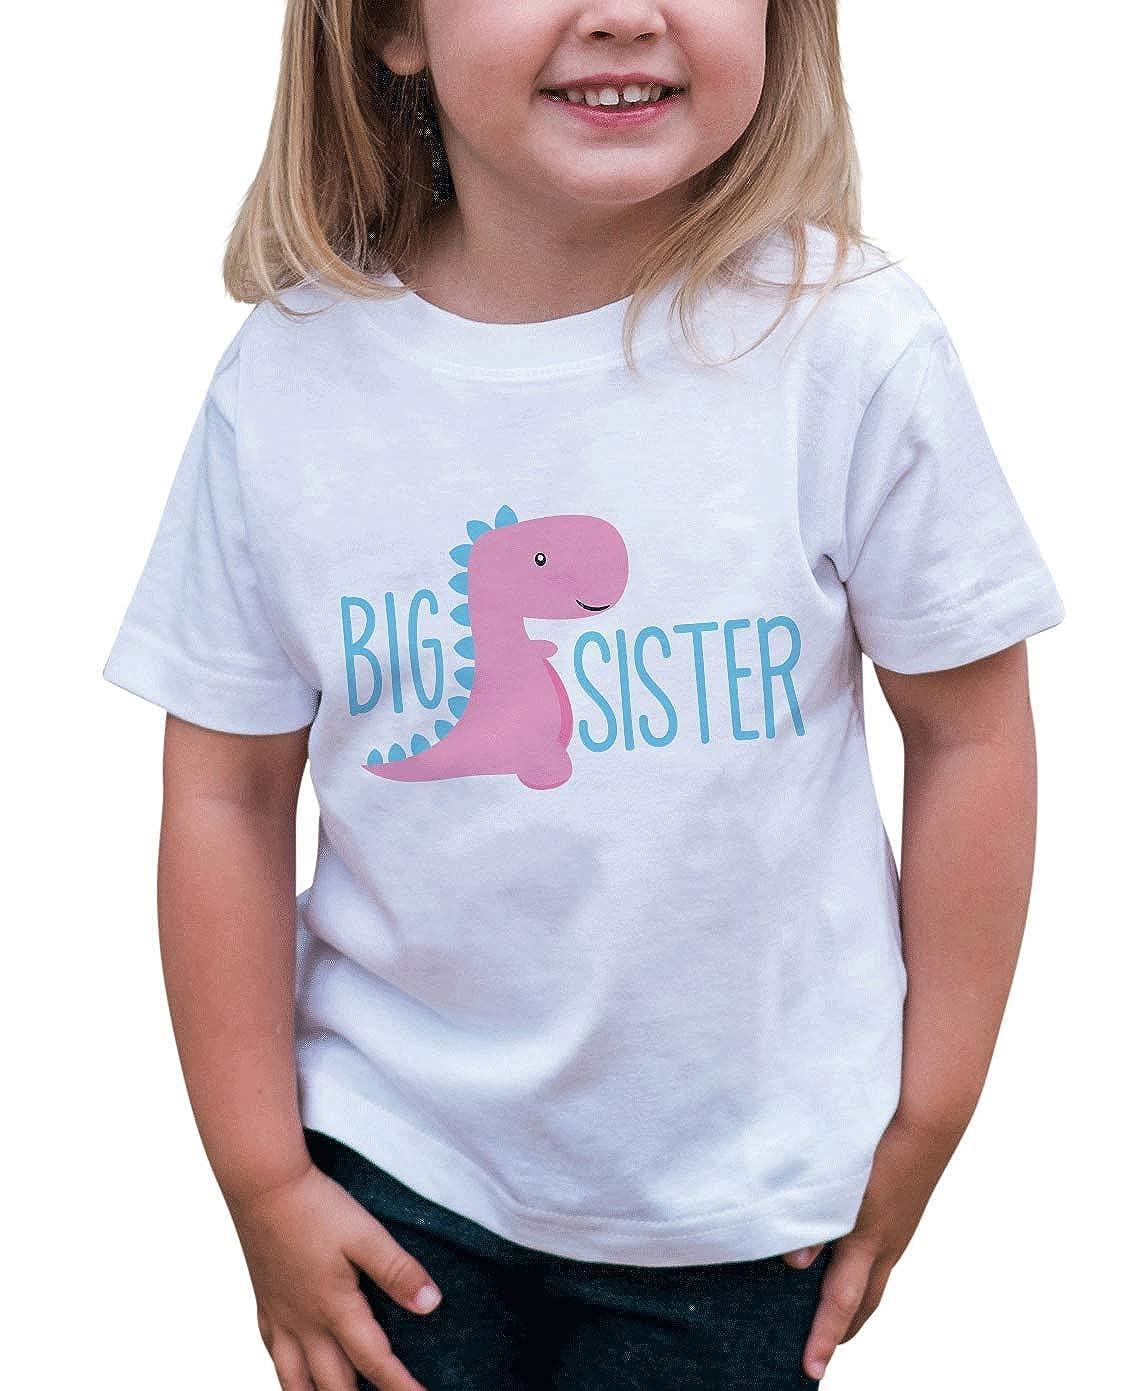 7 ate 9 Apparel Girls Dinosaur Big Sister T-Shirt